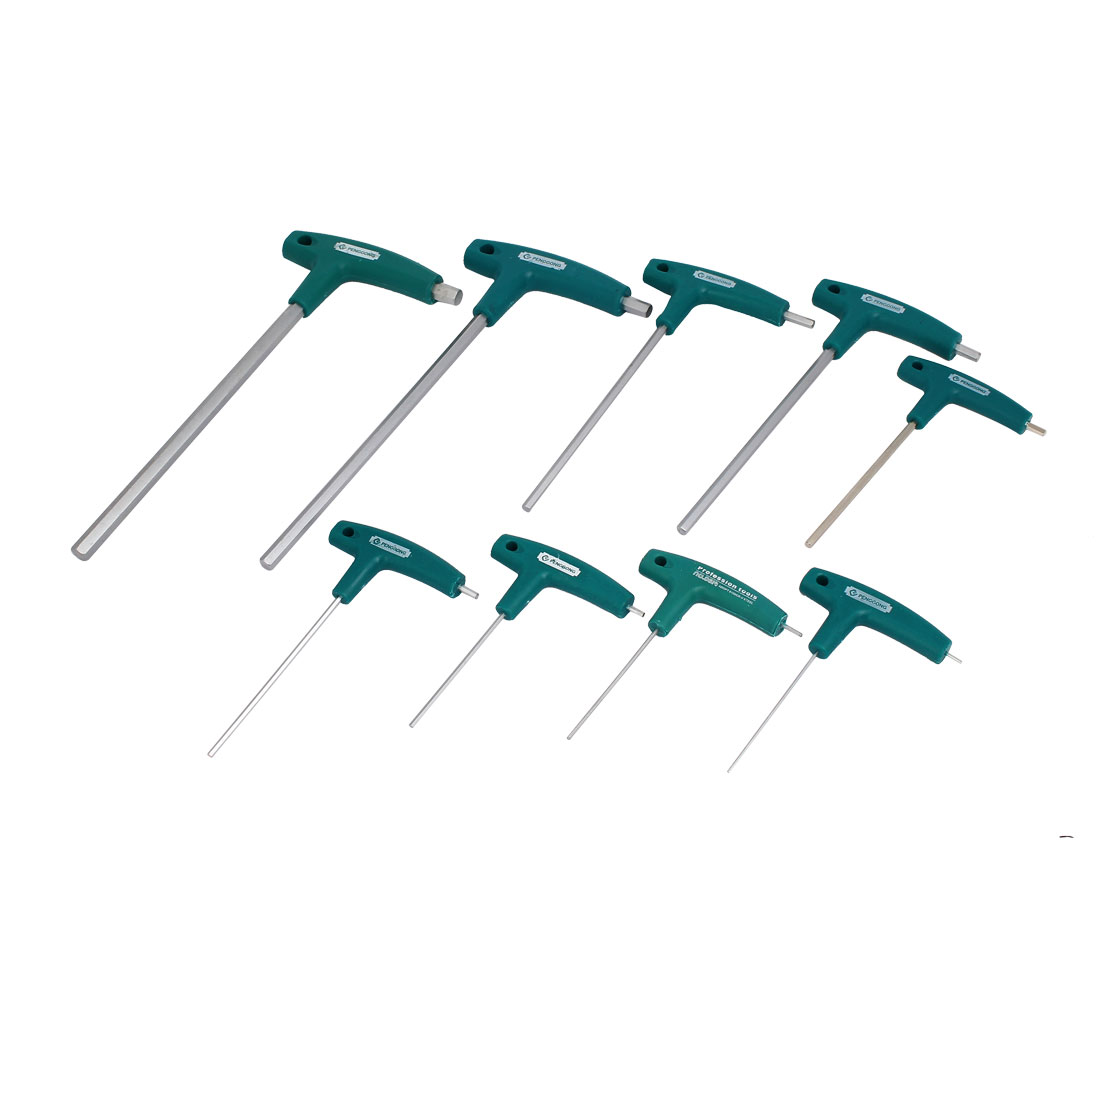 9 in 1 T Shape Handle Metric Hex Key Wrench Inner Hexagonal Spanner Set